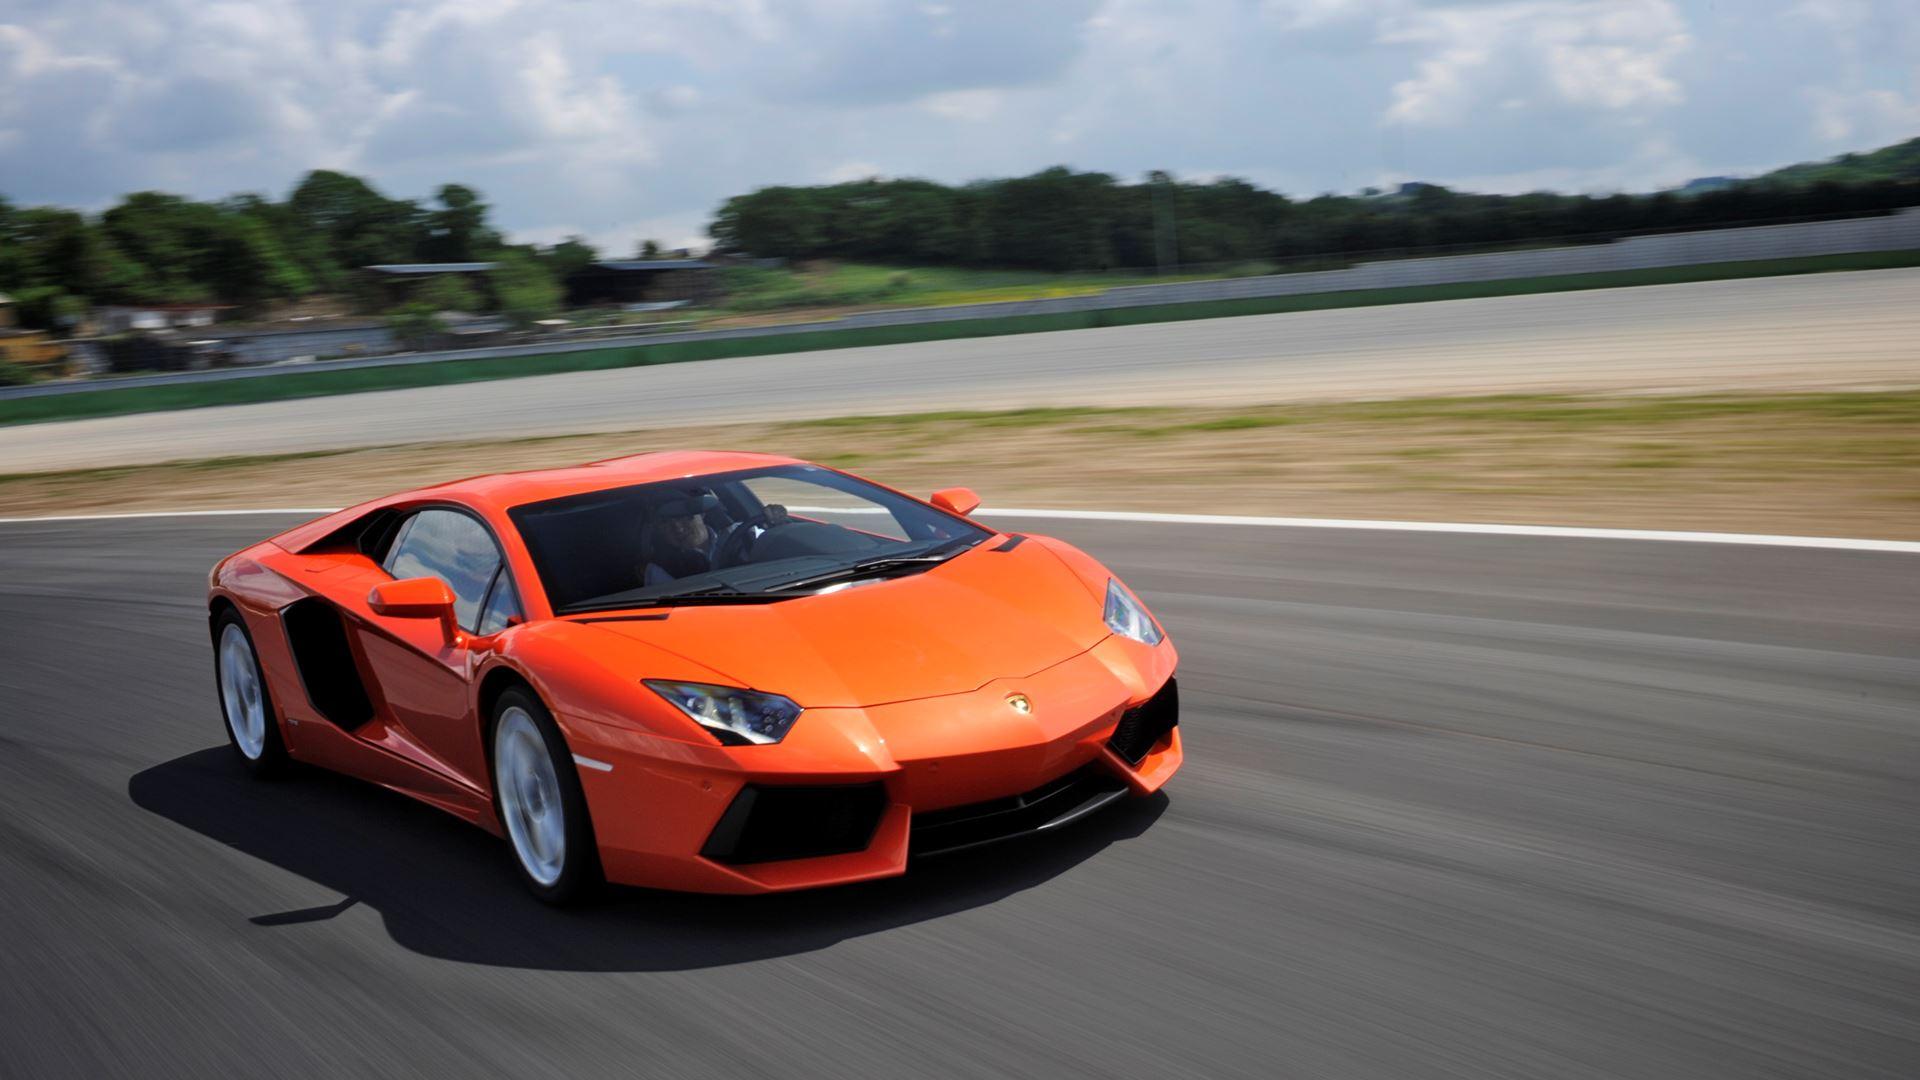 Lamborghini Aventador: 10 innovations in 10 years - Image 3